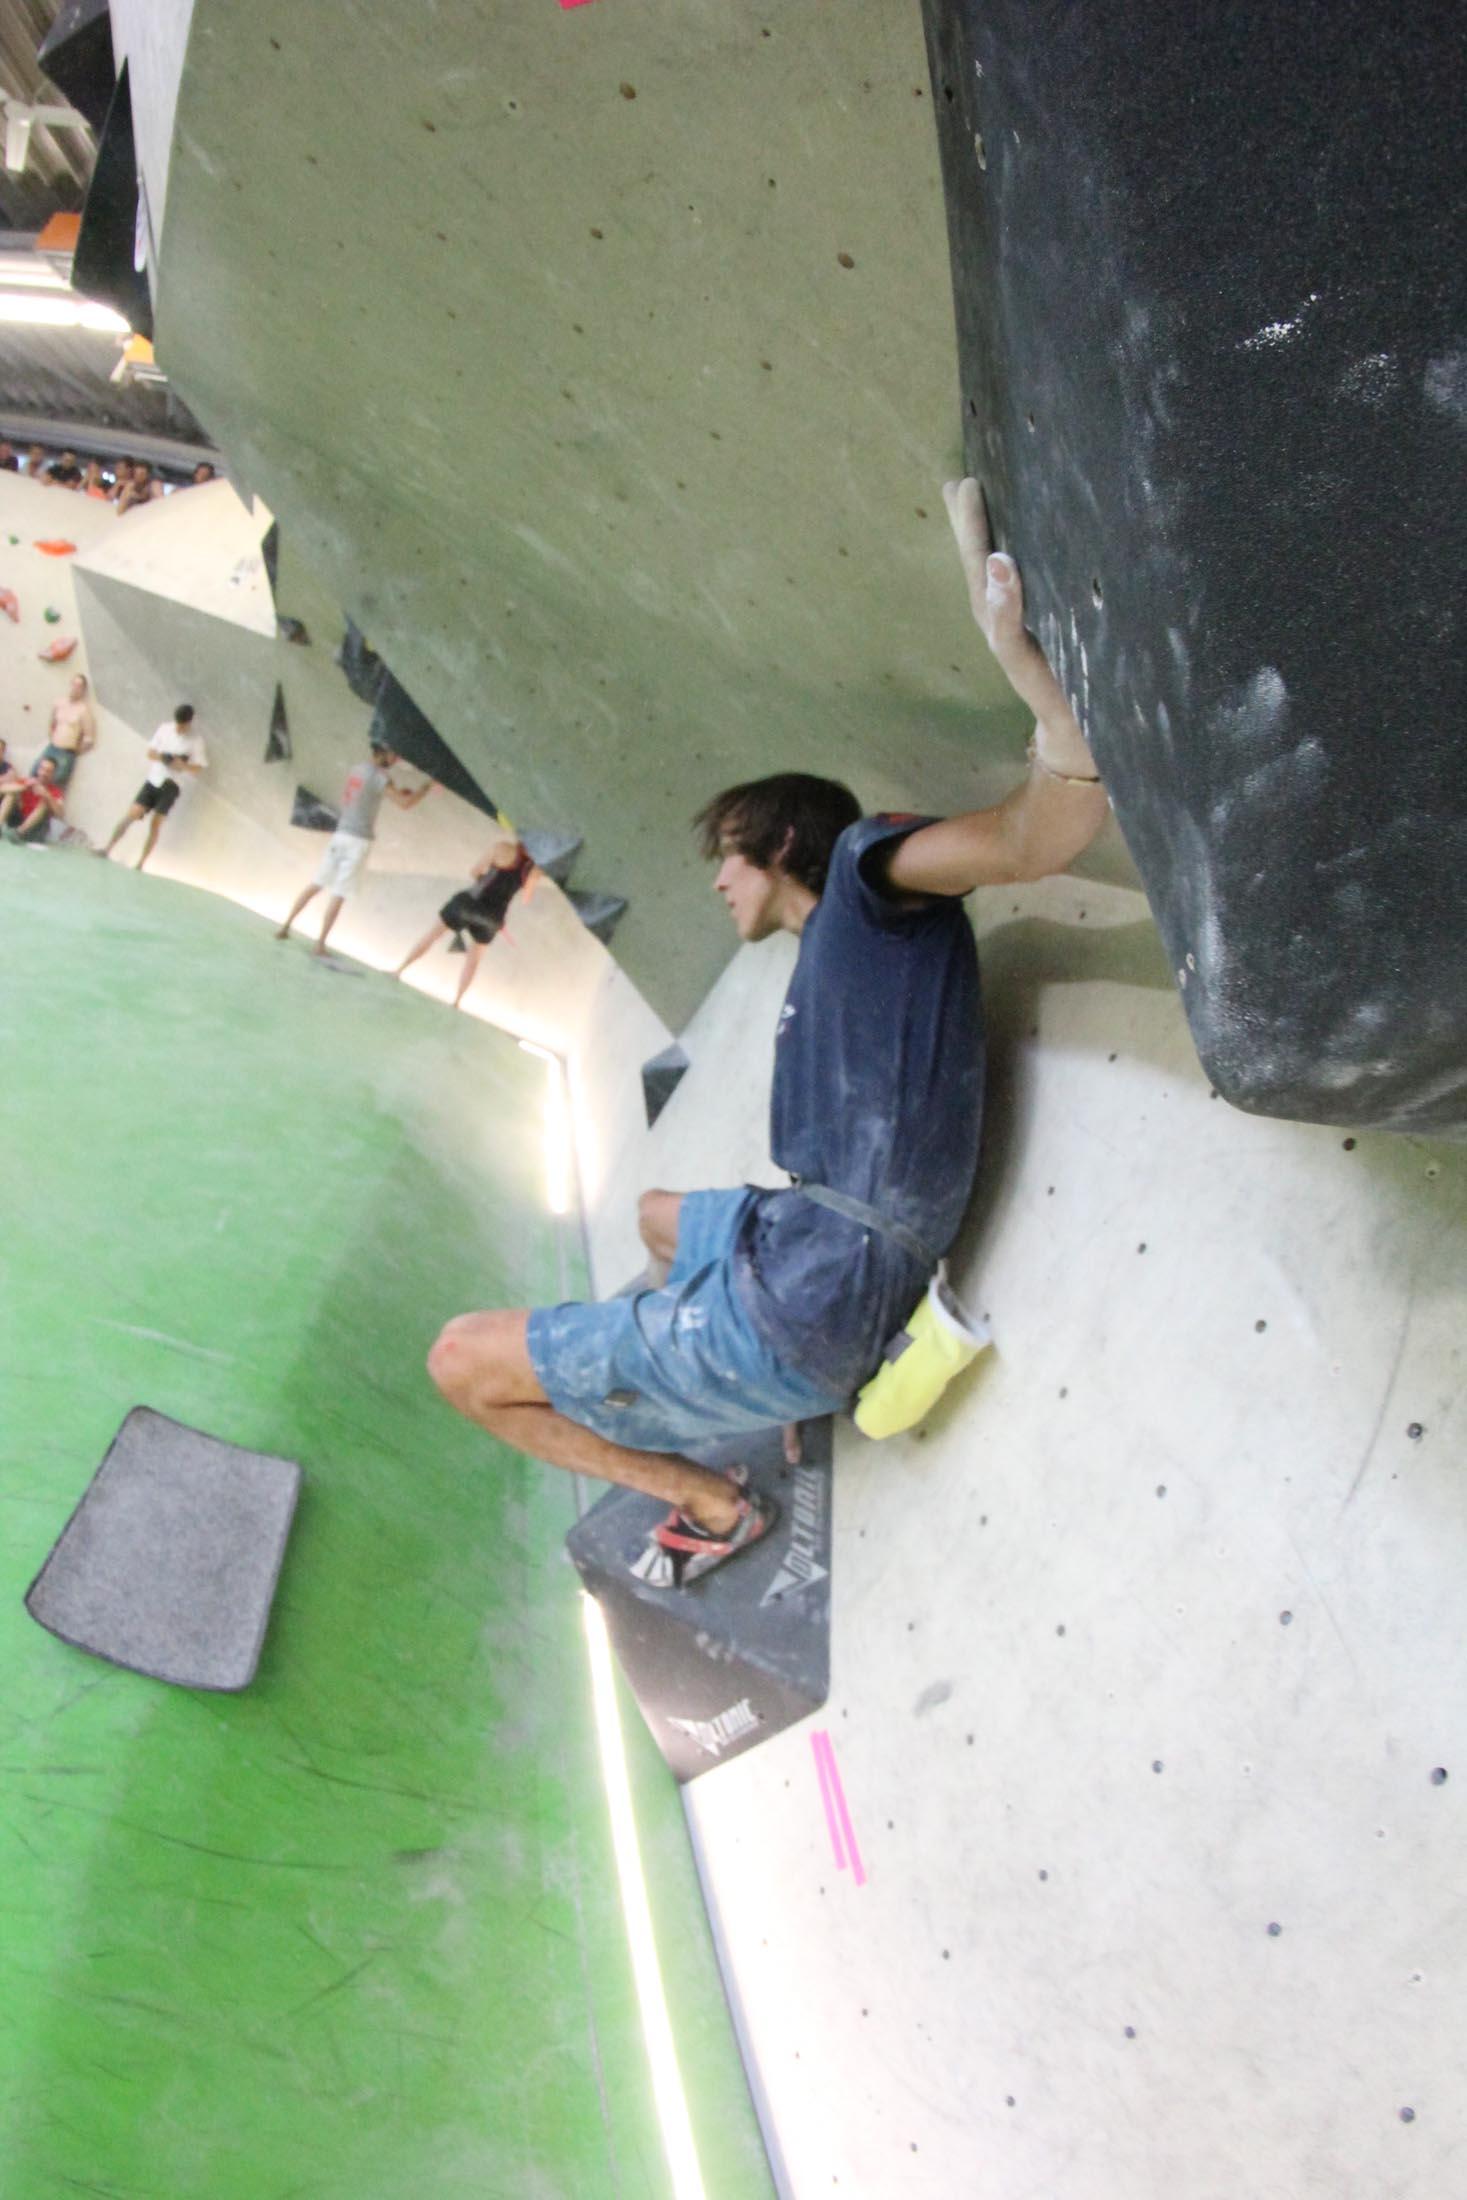 Finale, internationaler bouldercup Frankenjura 2016, BLOCKHELDEN Erlangen, Mammut, Bergfreunde.de, Boulderwettkampf07092016709